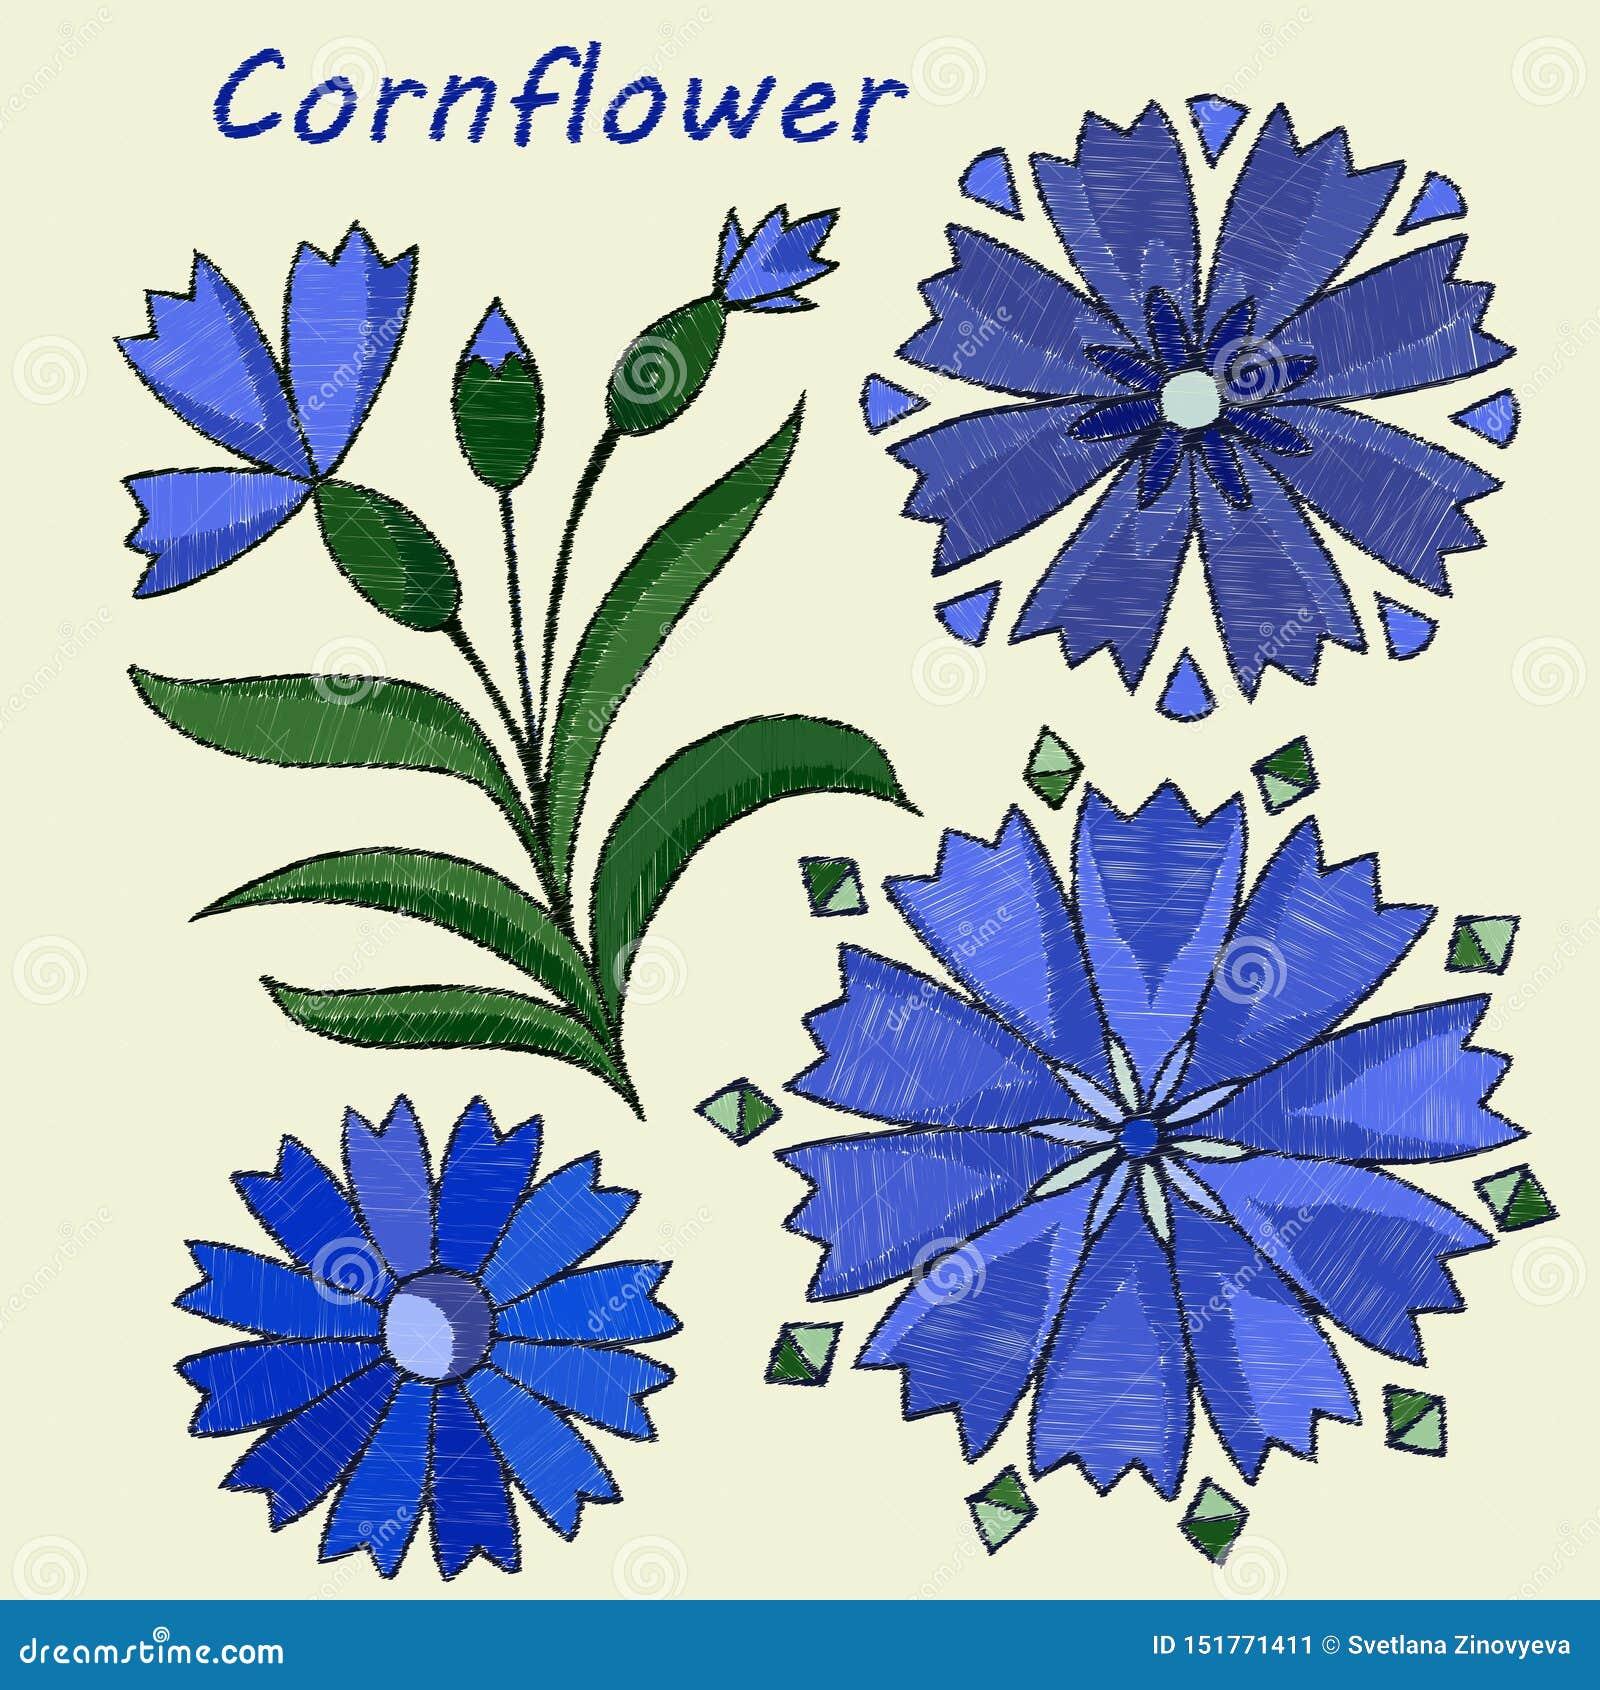 Stylized, embroidered elements, cornflower flower. Vector